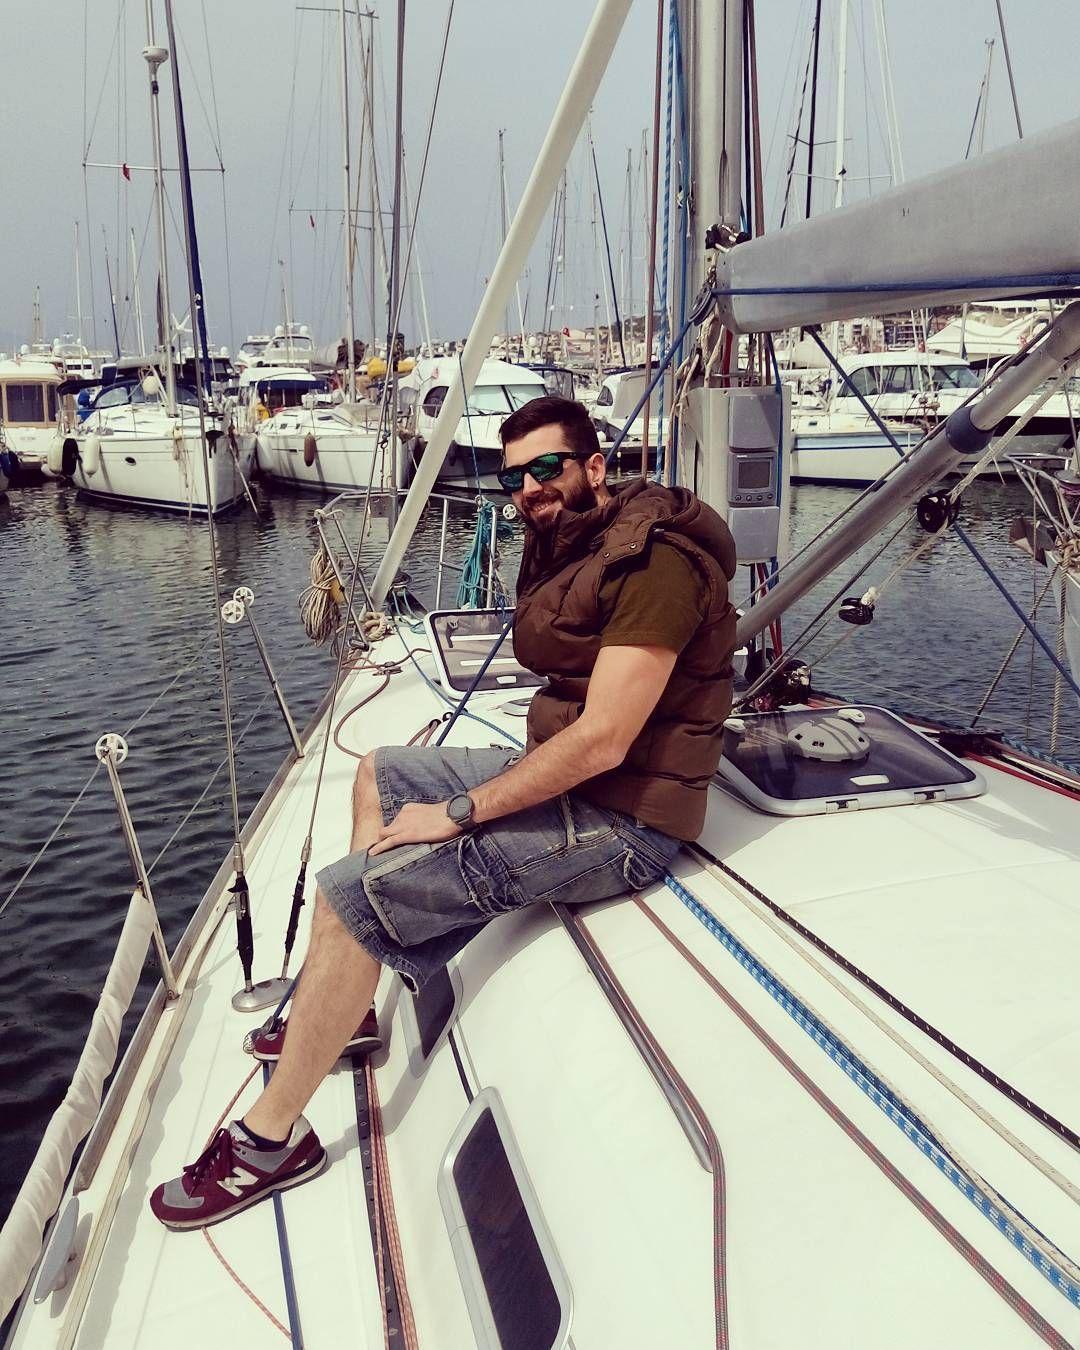 Let's go.. #sail #sailor #sailboat #sailboating #wind #sea #season #photooftheday #instalike #instasky #instasea #likeme #likeforlike #likemenow #like4like  #vsphoto #instacool #skyporn #instadaily #cute #windyday #sun #instafire #life #cesme #wild #young #free by yigitcankesova